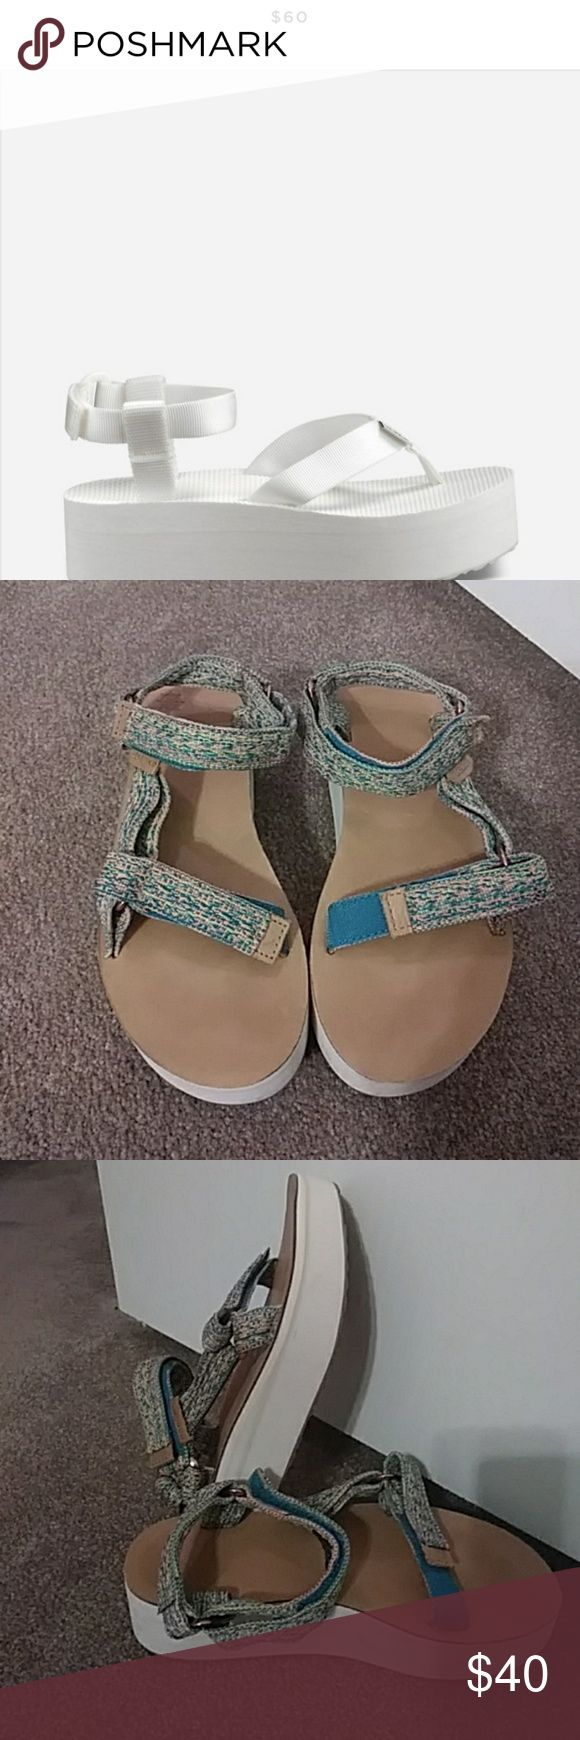 Teva sandles flatform. Minor scuff marks on sides. Written once.  Velcrow adjustment straps. Teva Shoes Sandals